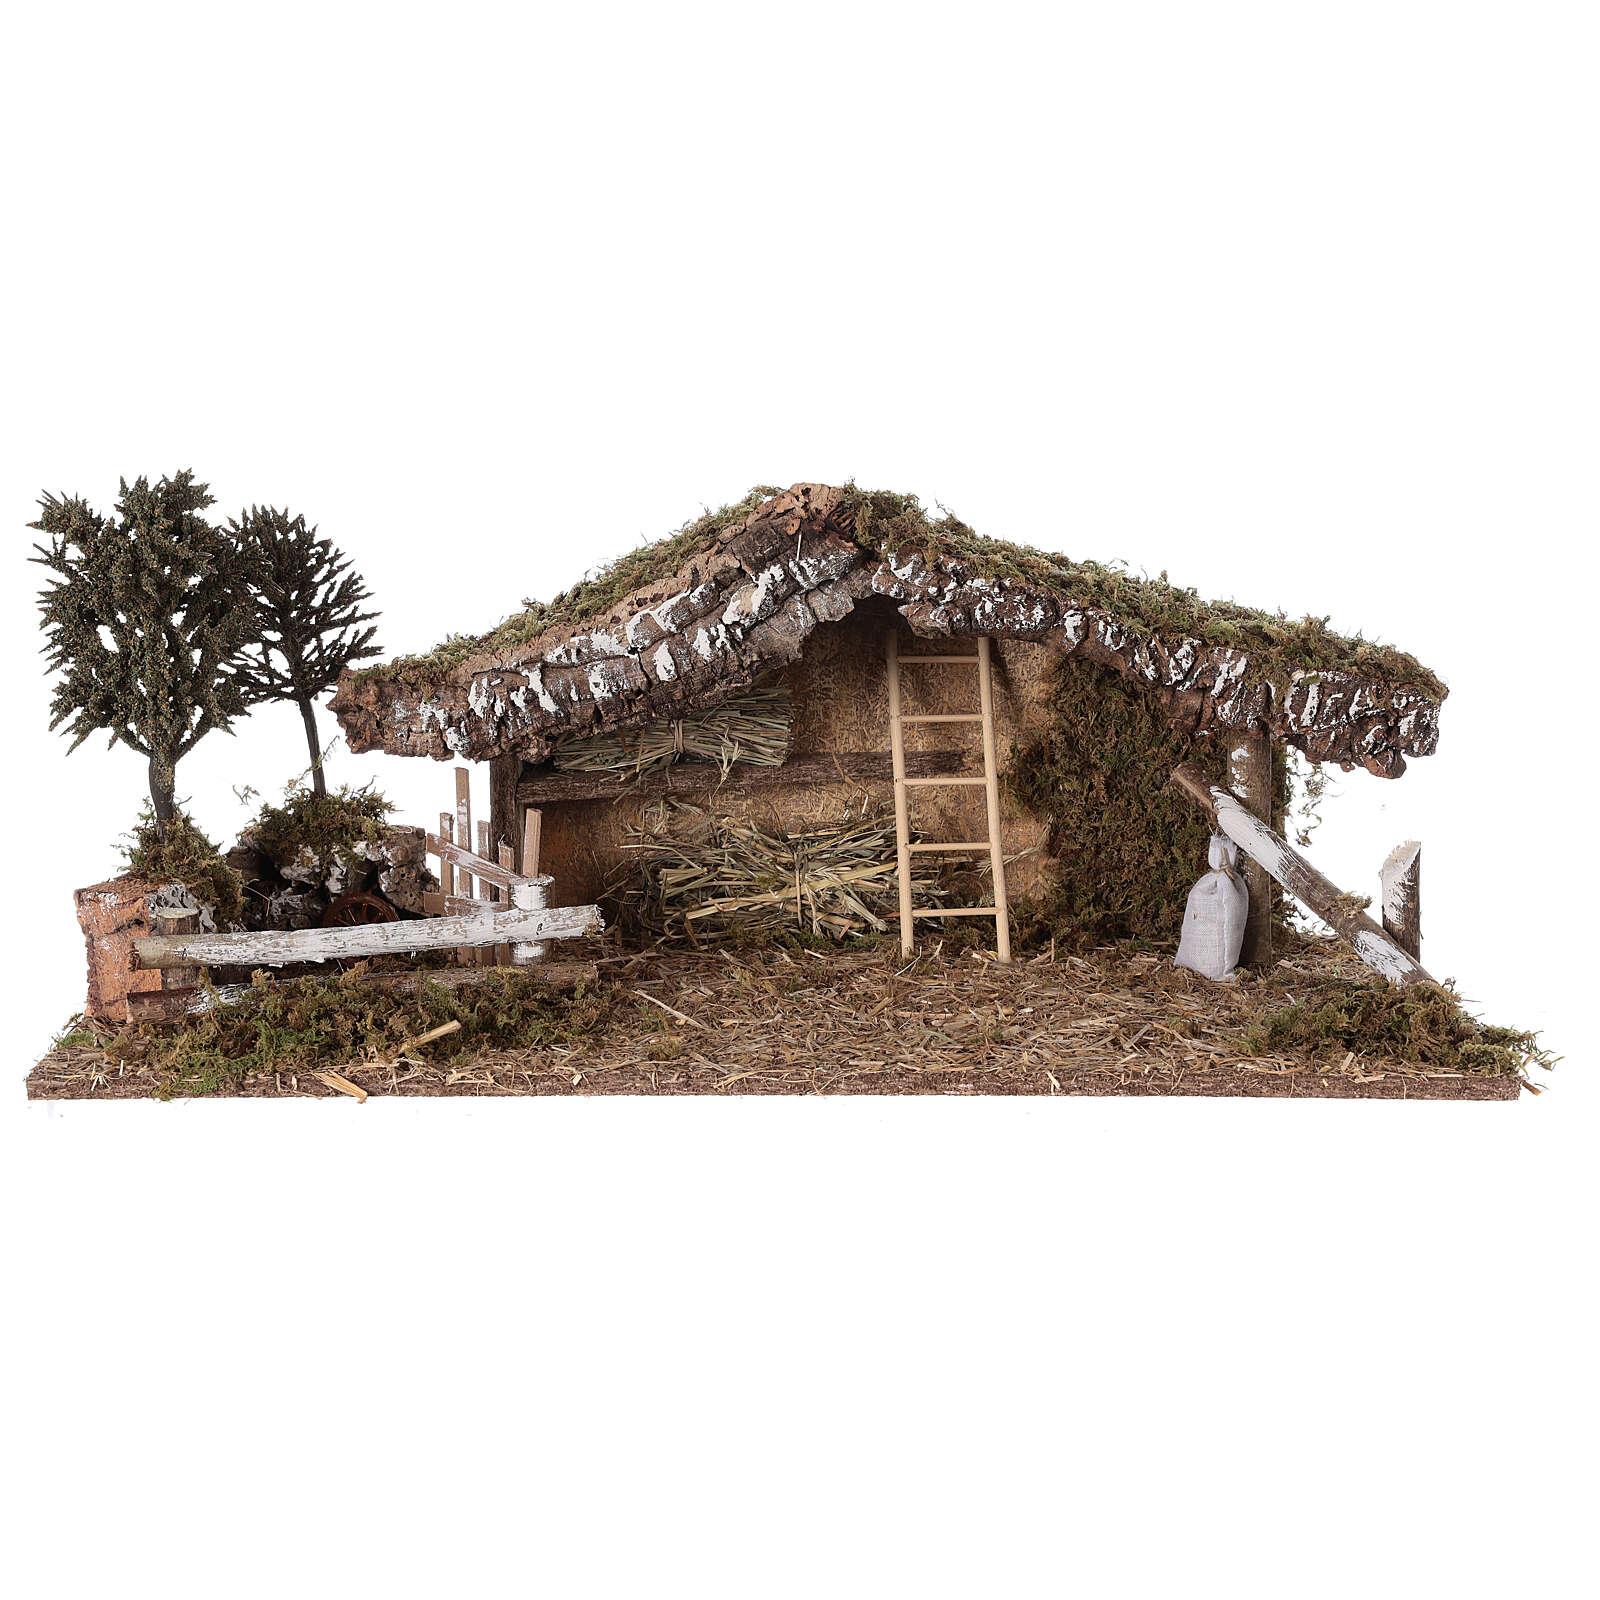 Capanna con recinto e alberi 55x25x20 cm presepe 10 cm 4